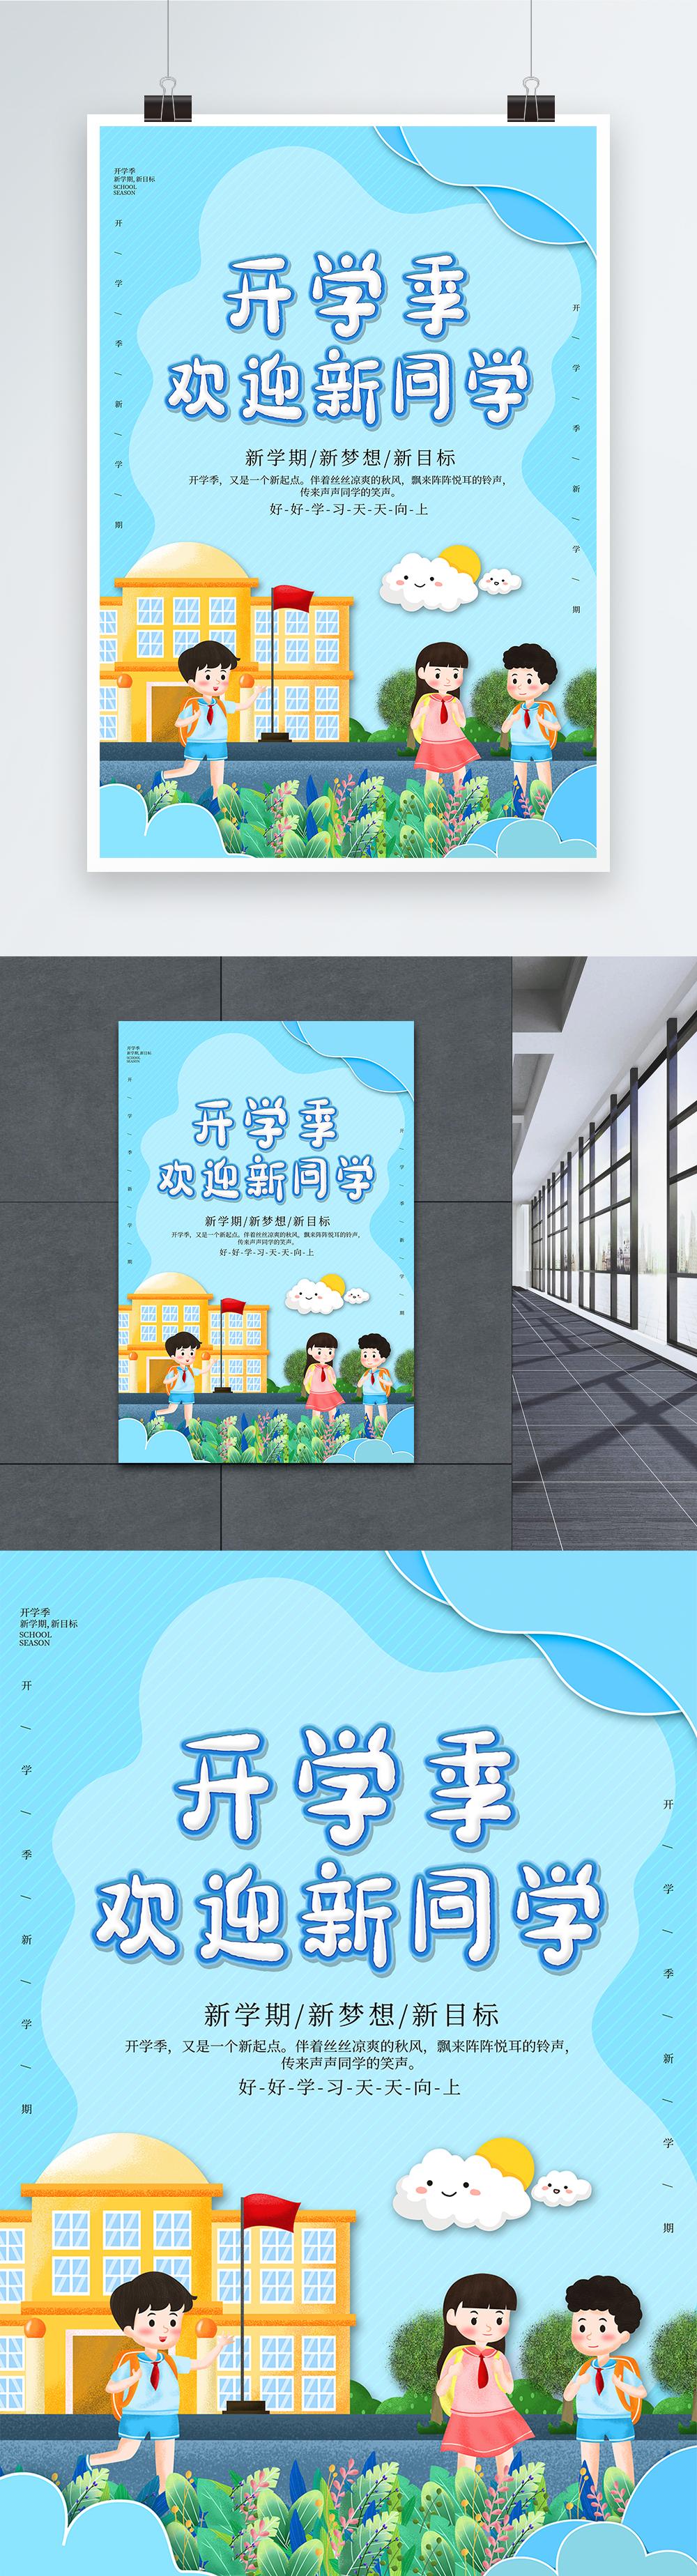 Poster Promosi Lucu Musim Sekolah Kuning Muda Gambar Unduh Gratis Templat 727115128 Format Gambar Ai Lovepik Com